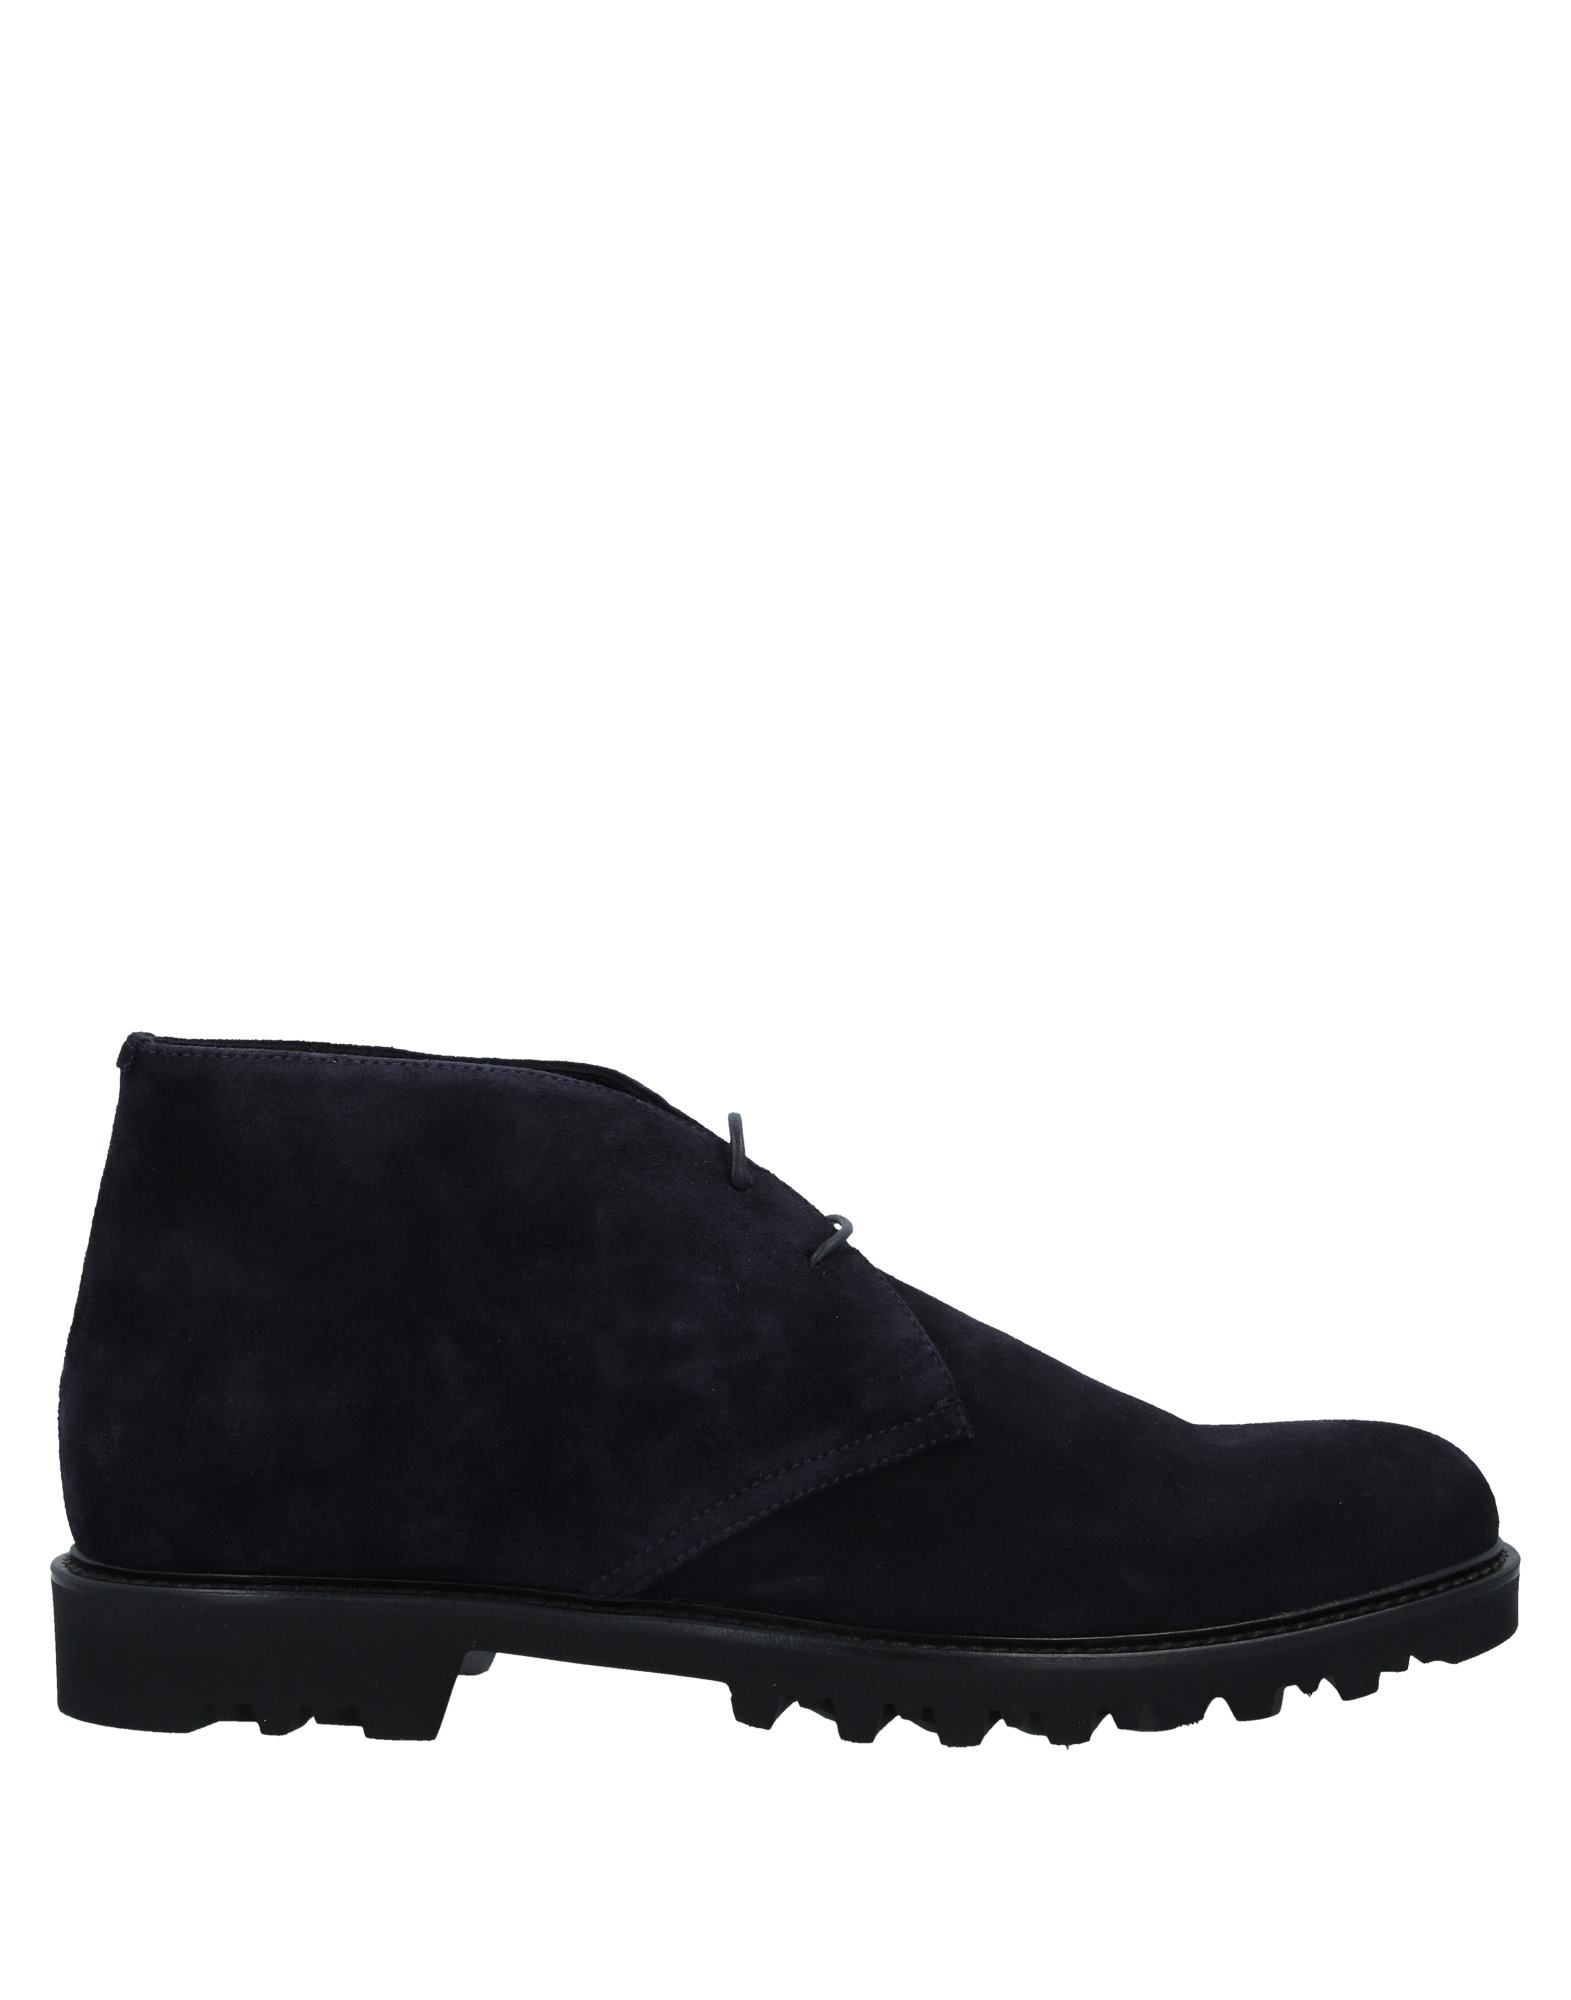 Giorgio Armani Stiefelette Qualität Herren  11451536AM Gute Qualität Stiefelette beliebte Schuhe a2ea3a